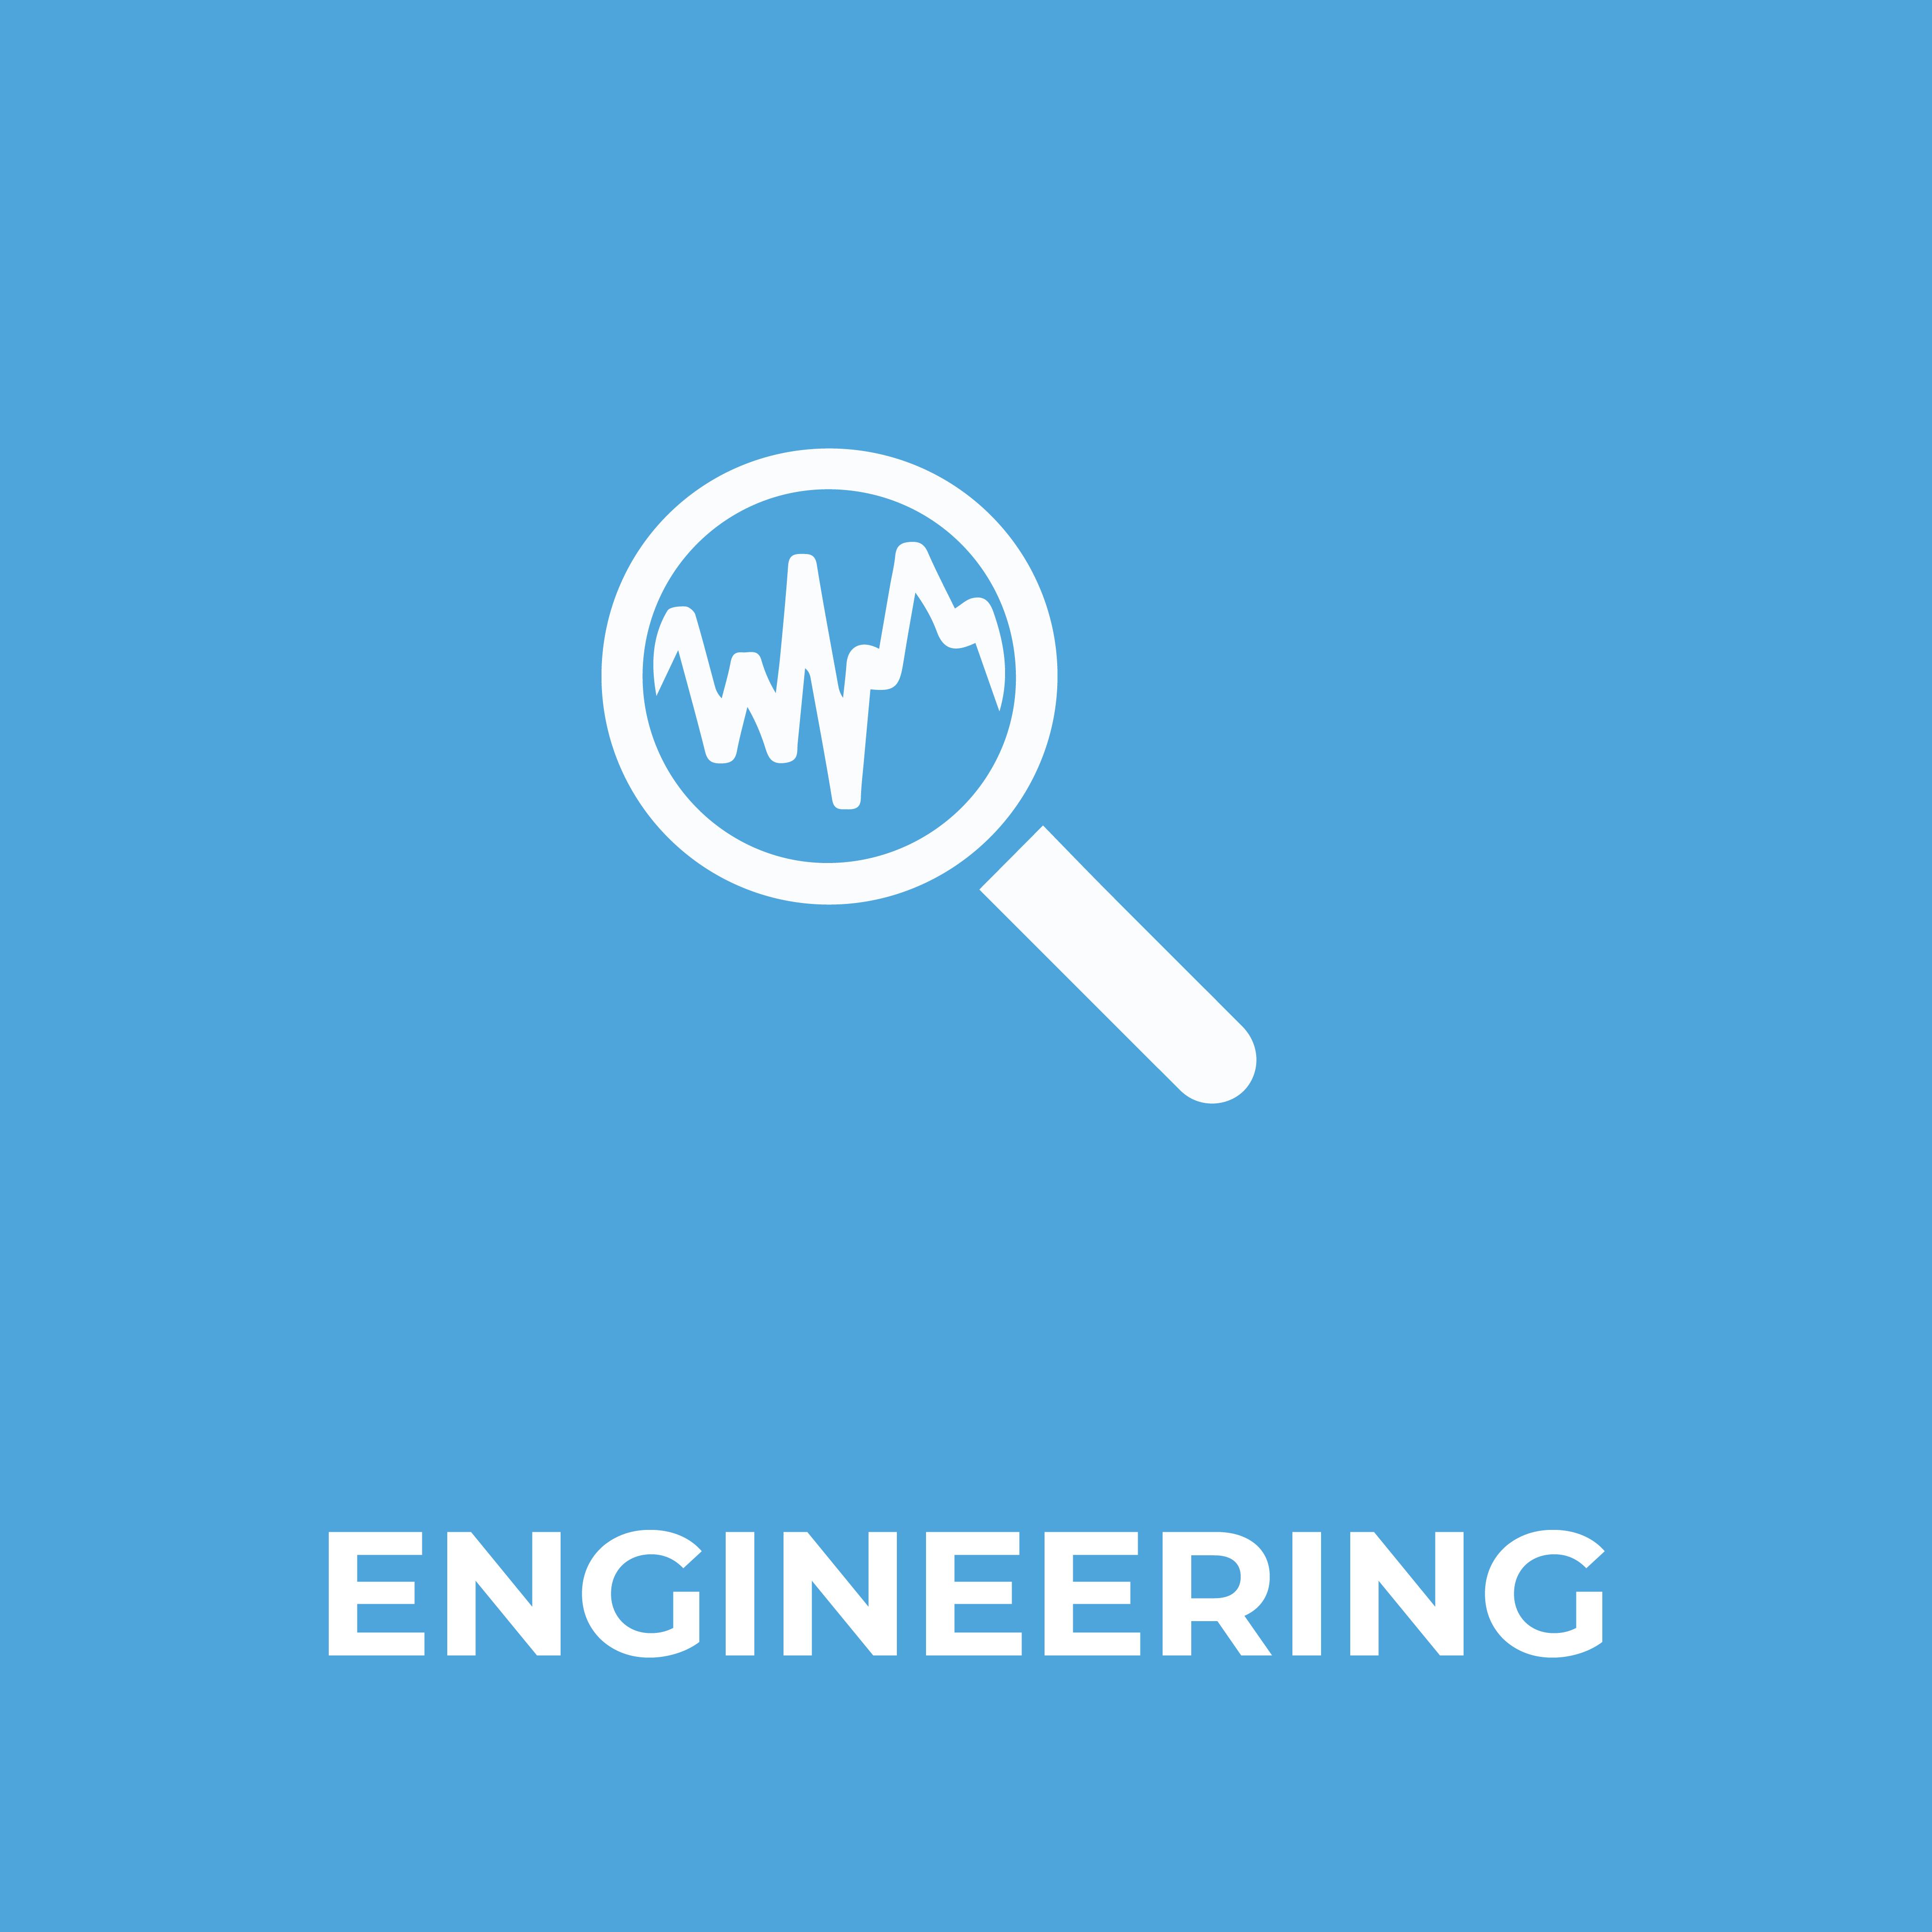 ENGINEEERING ICON-01